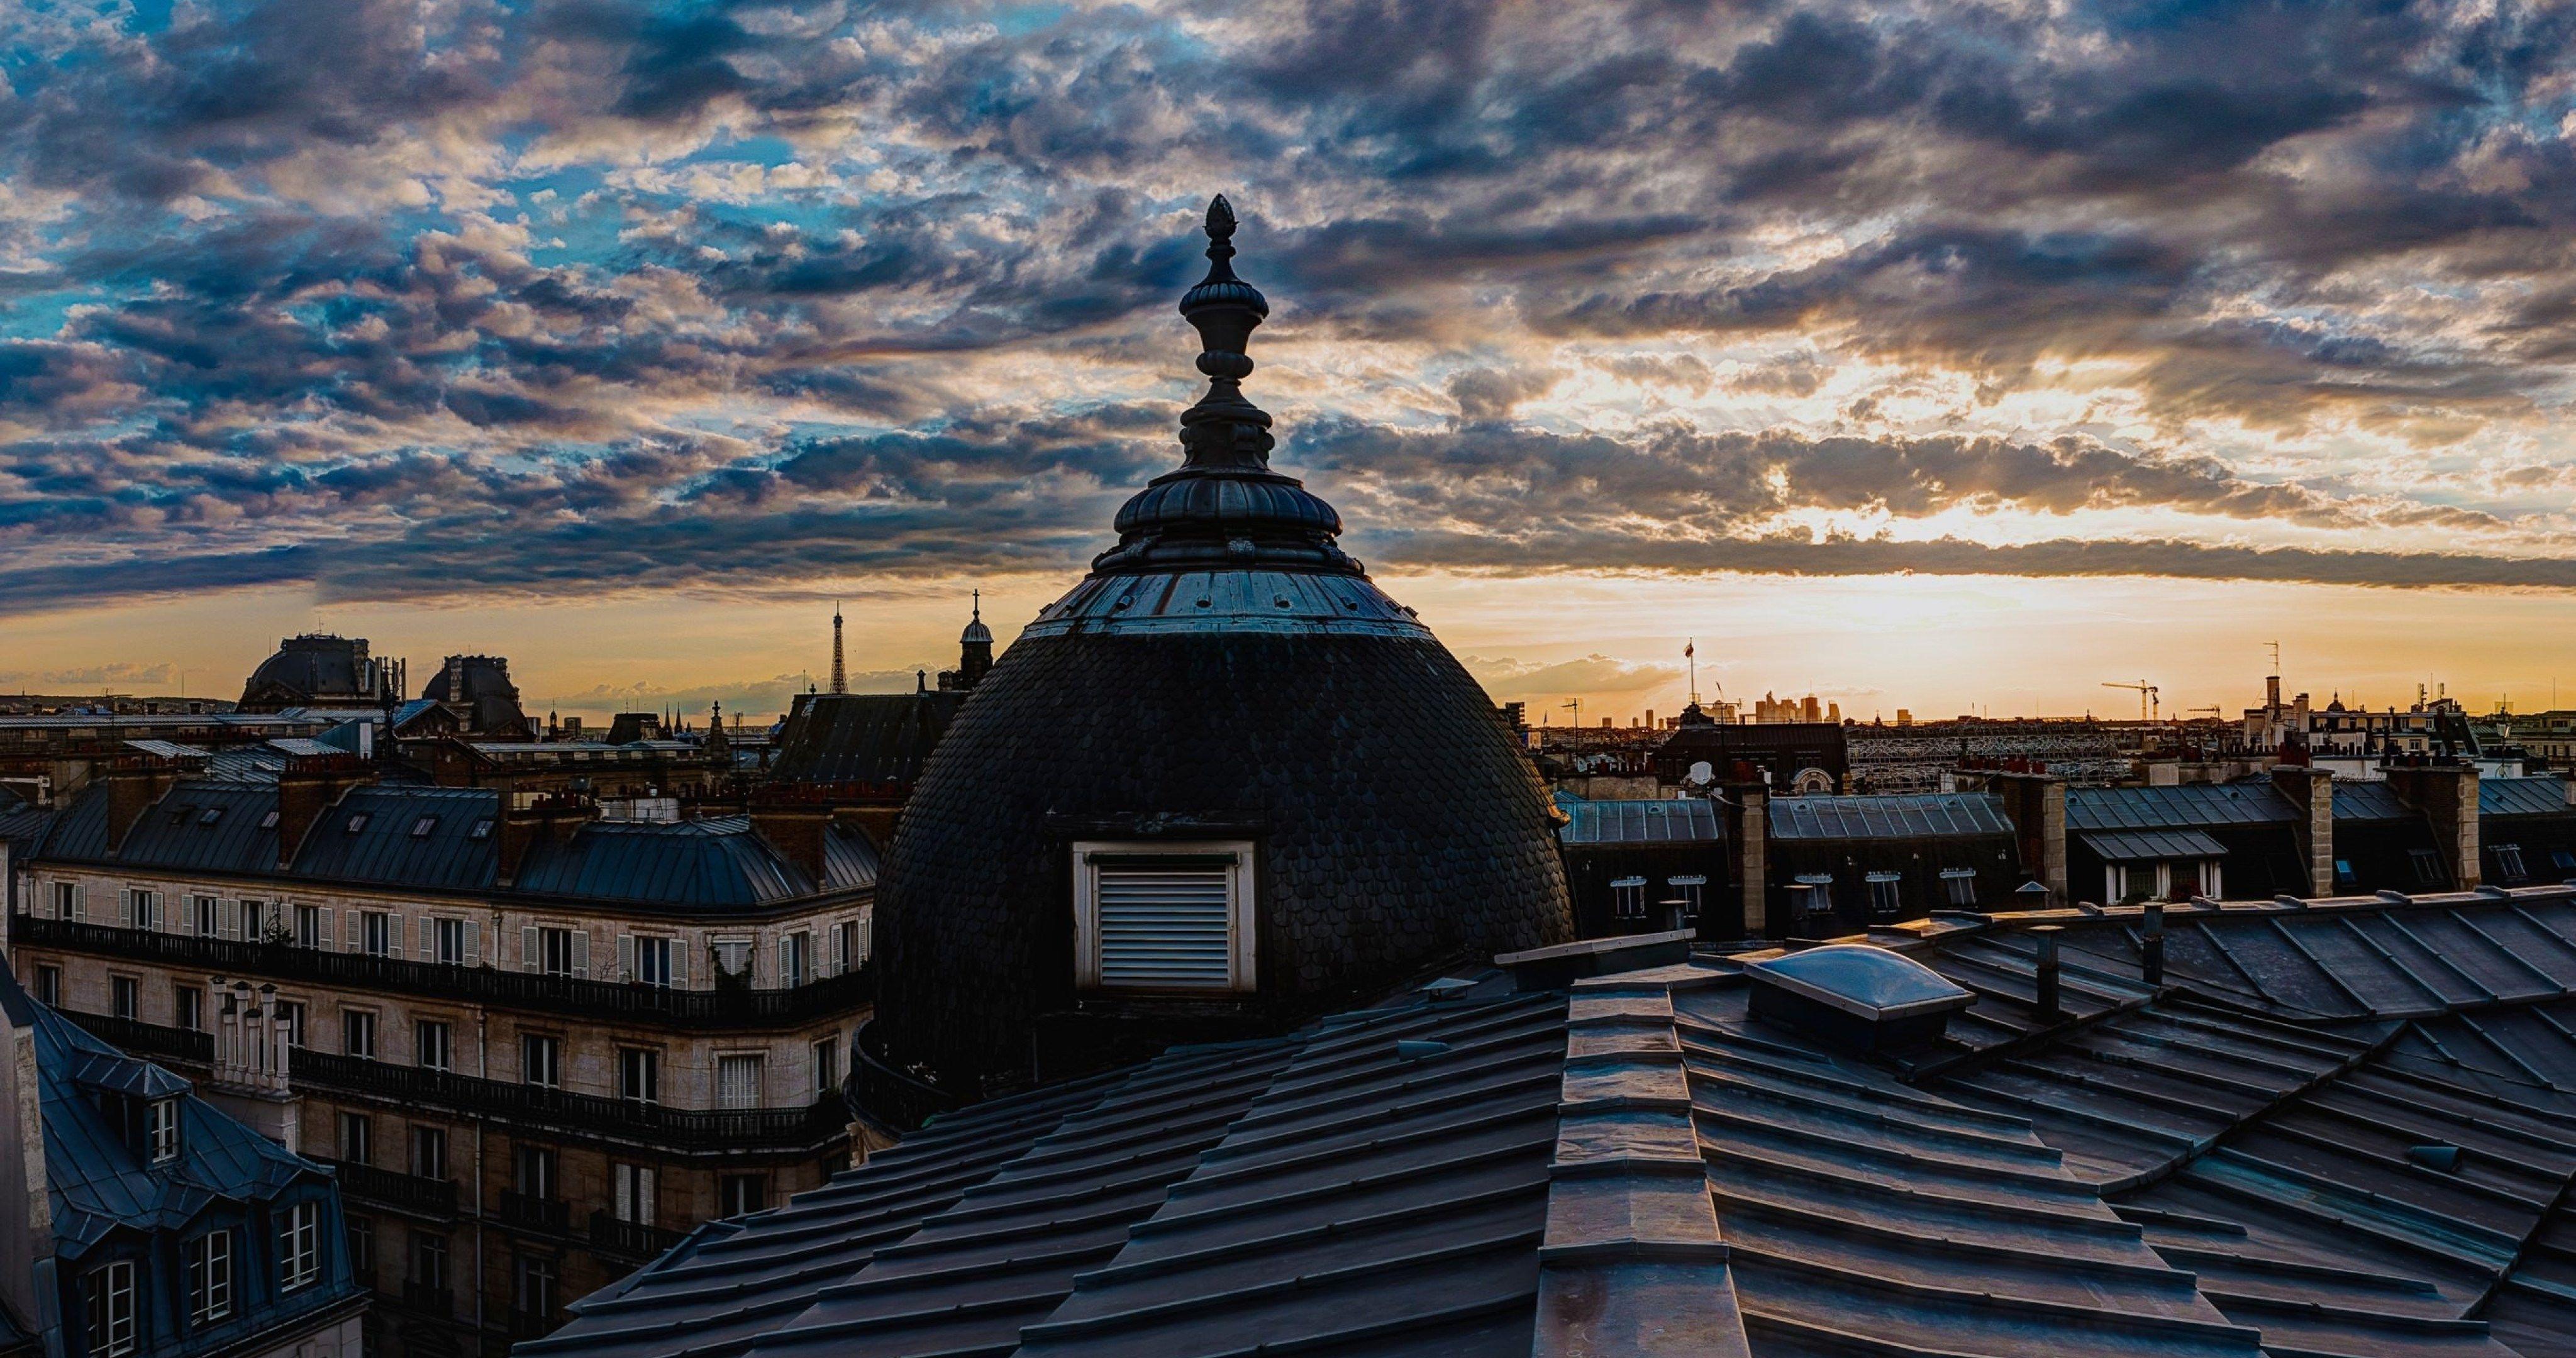 paris roof 4k ultra hd wallpaper ololoshenka Hd wallpaper 4096x2160